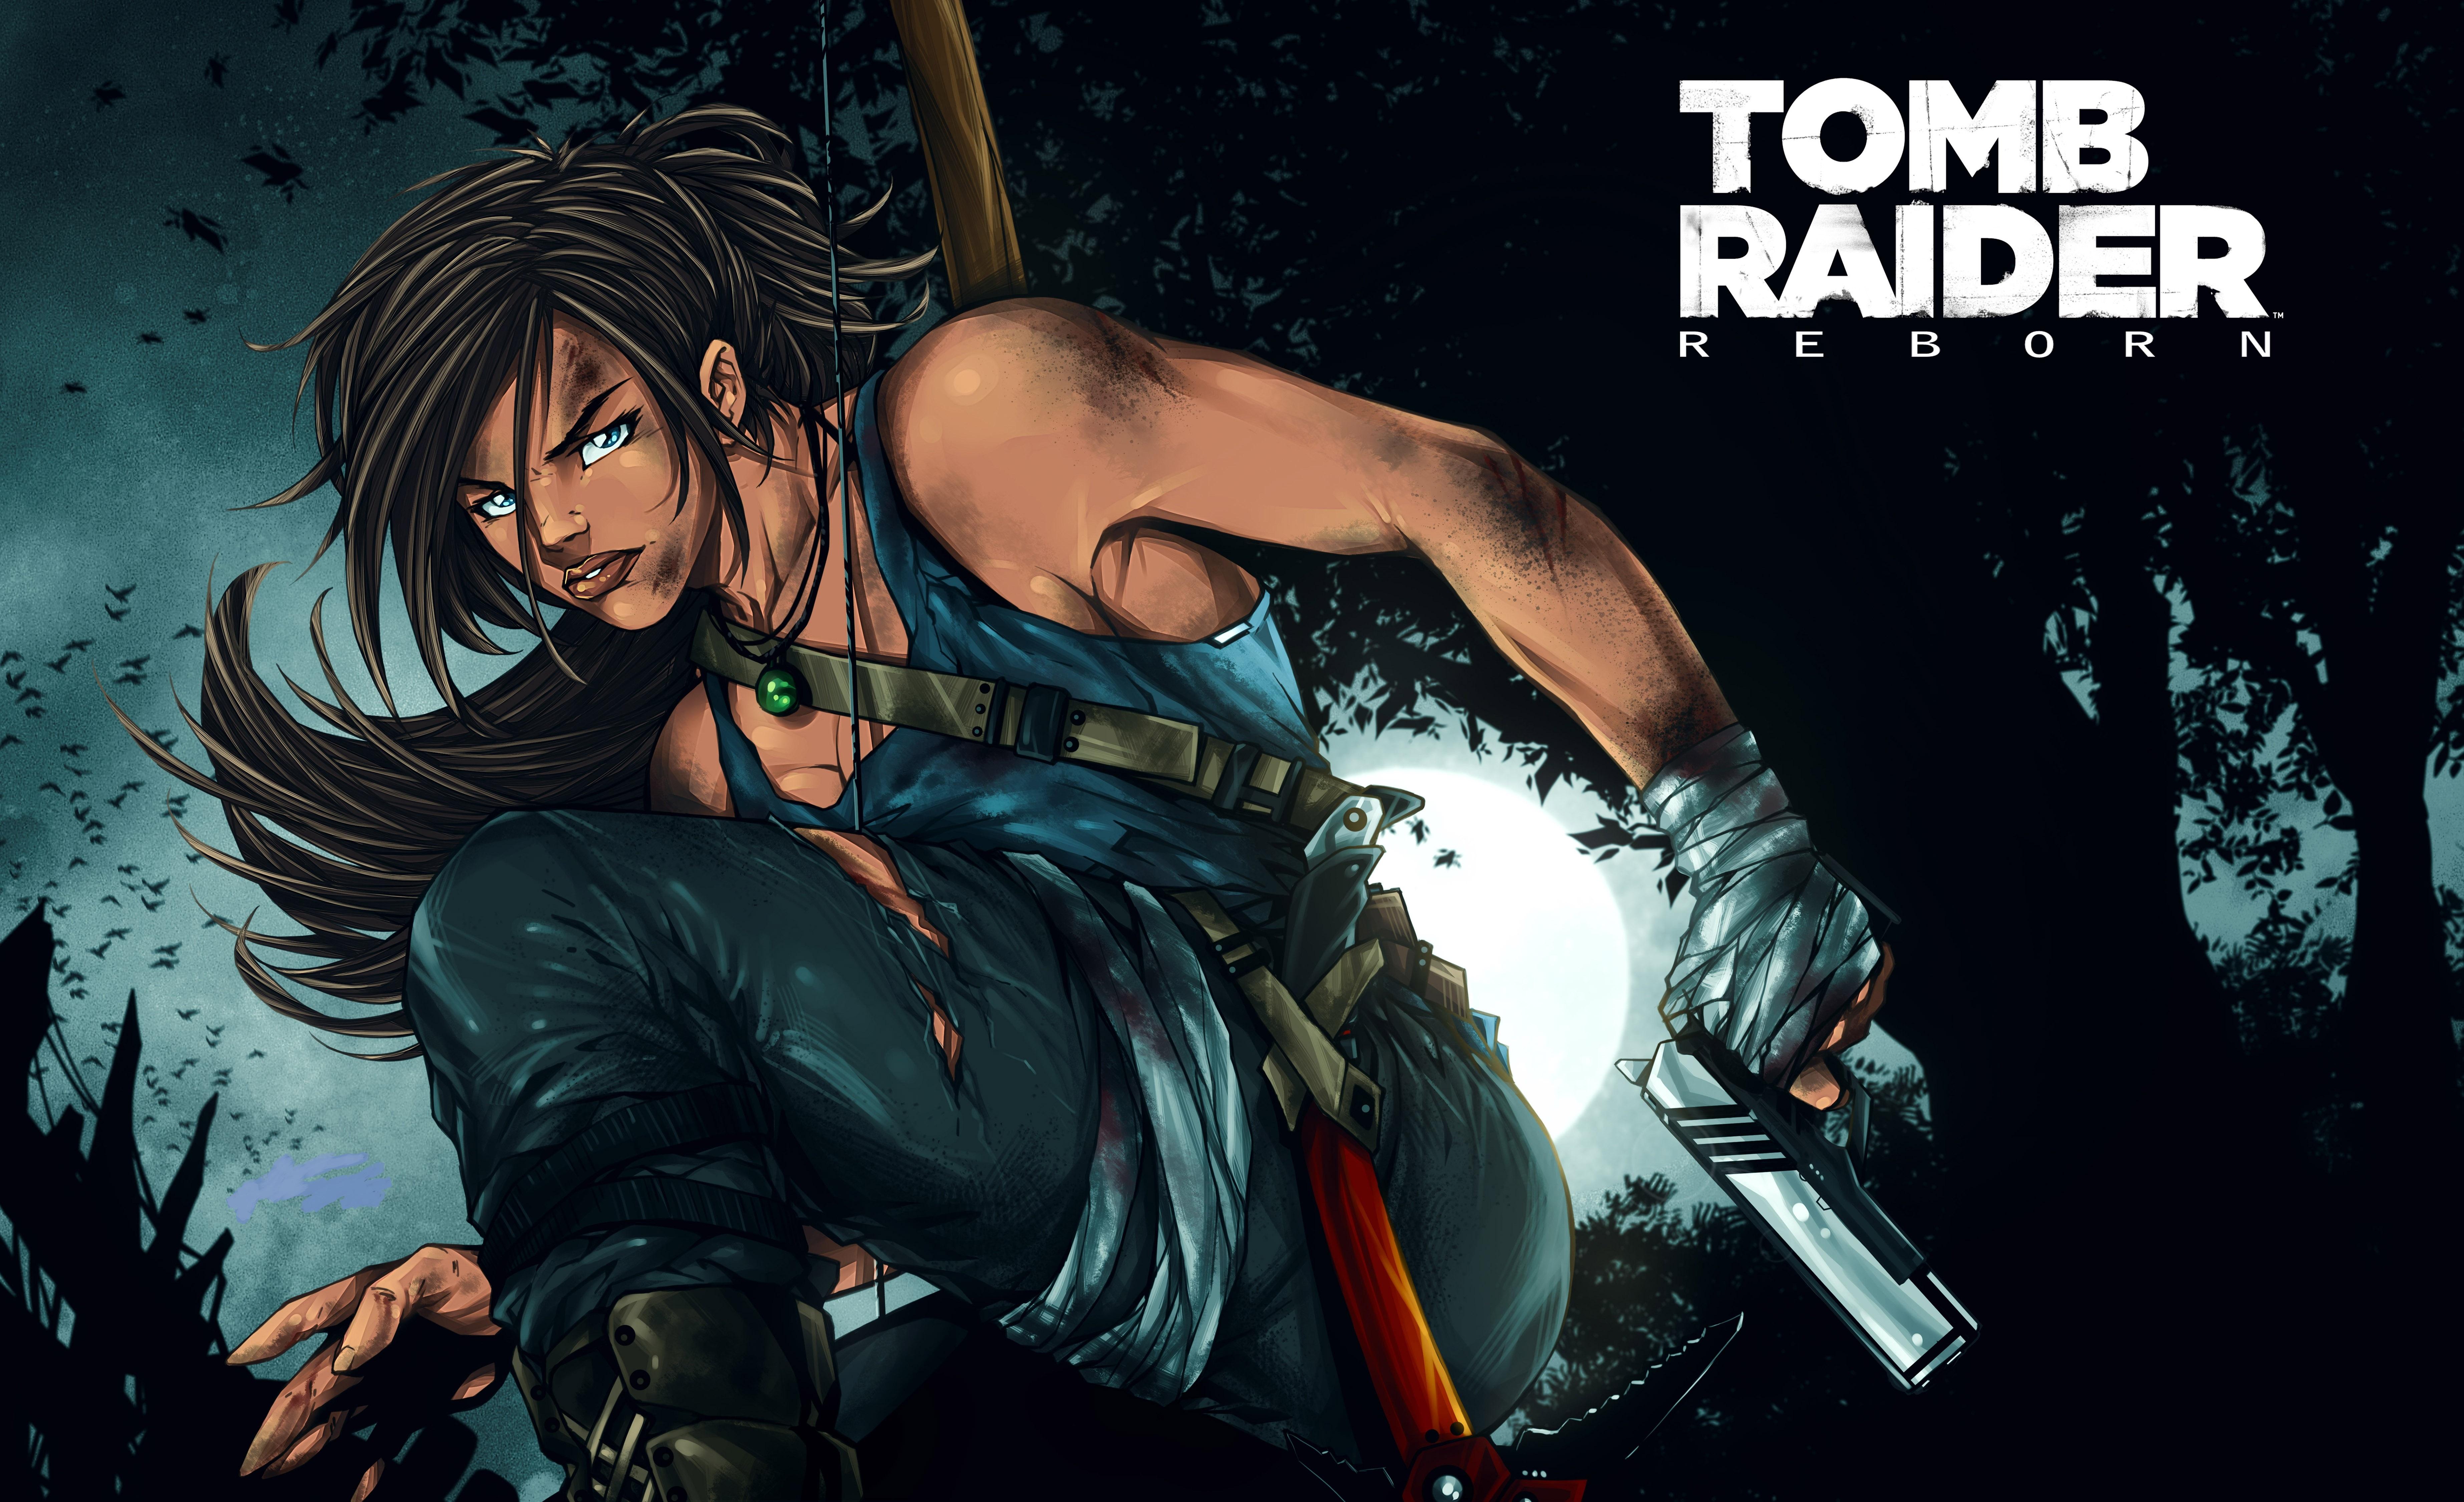 7680x4320 Lara Croft 8k Artwork 8k Hd 4k Wallpapers: Tomb Raider Reborn, HD 8K Wallpaper